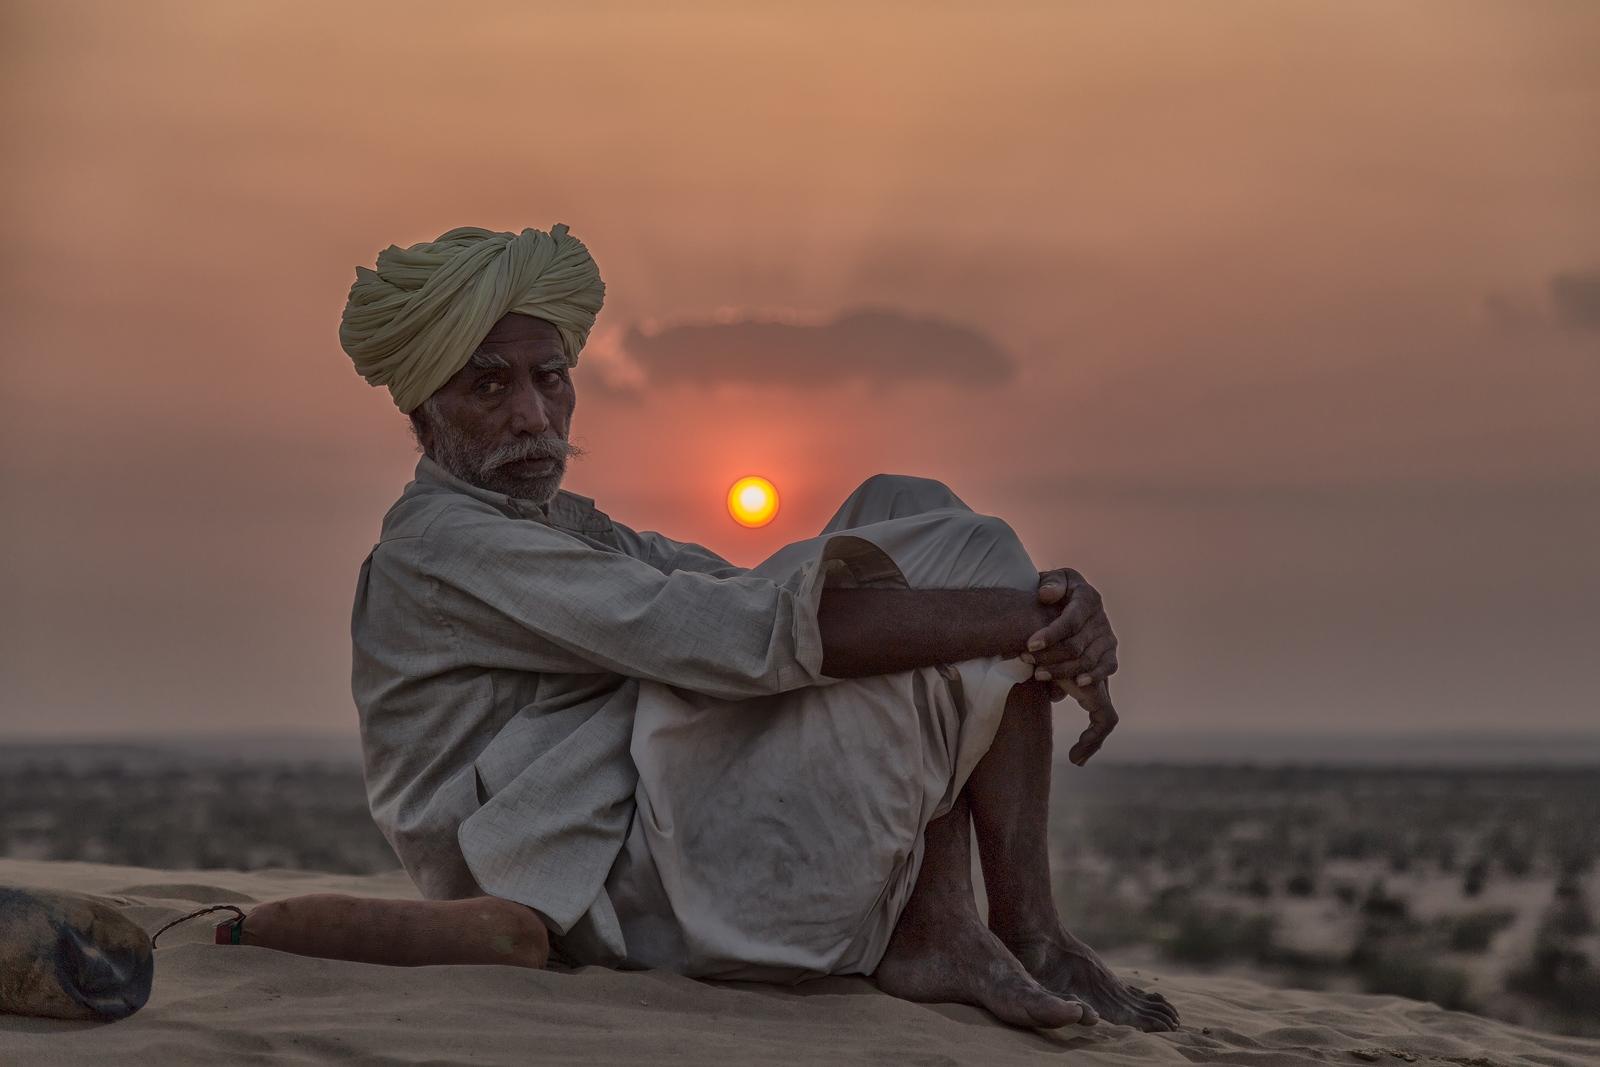 Desierto del Thar. Frontera India-Pakistan